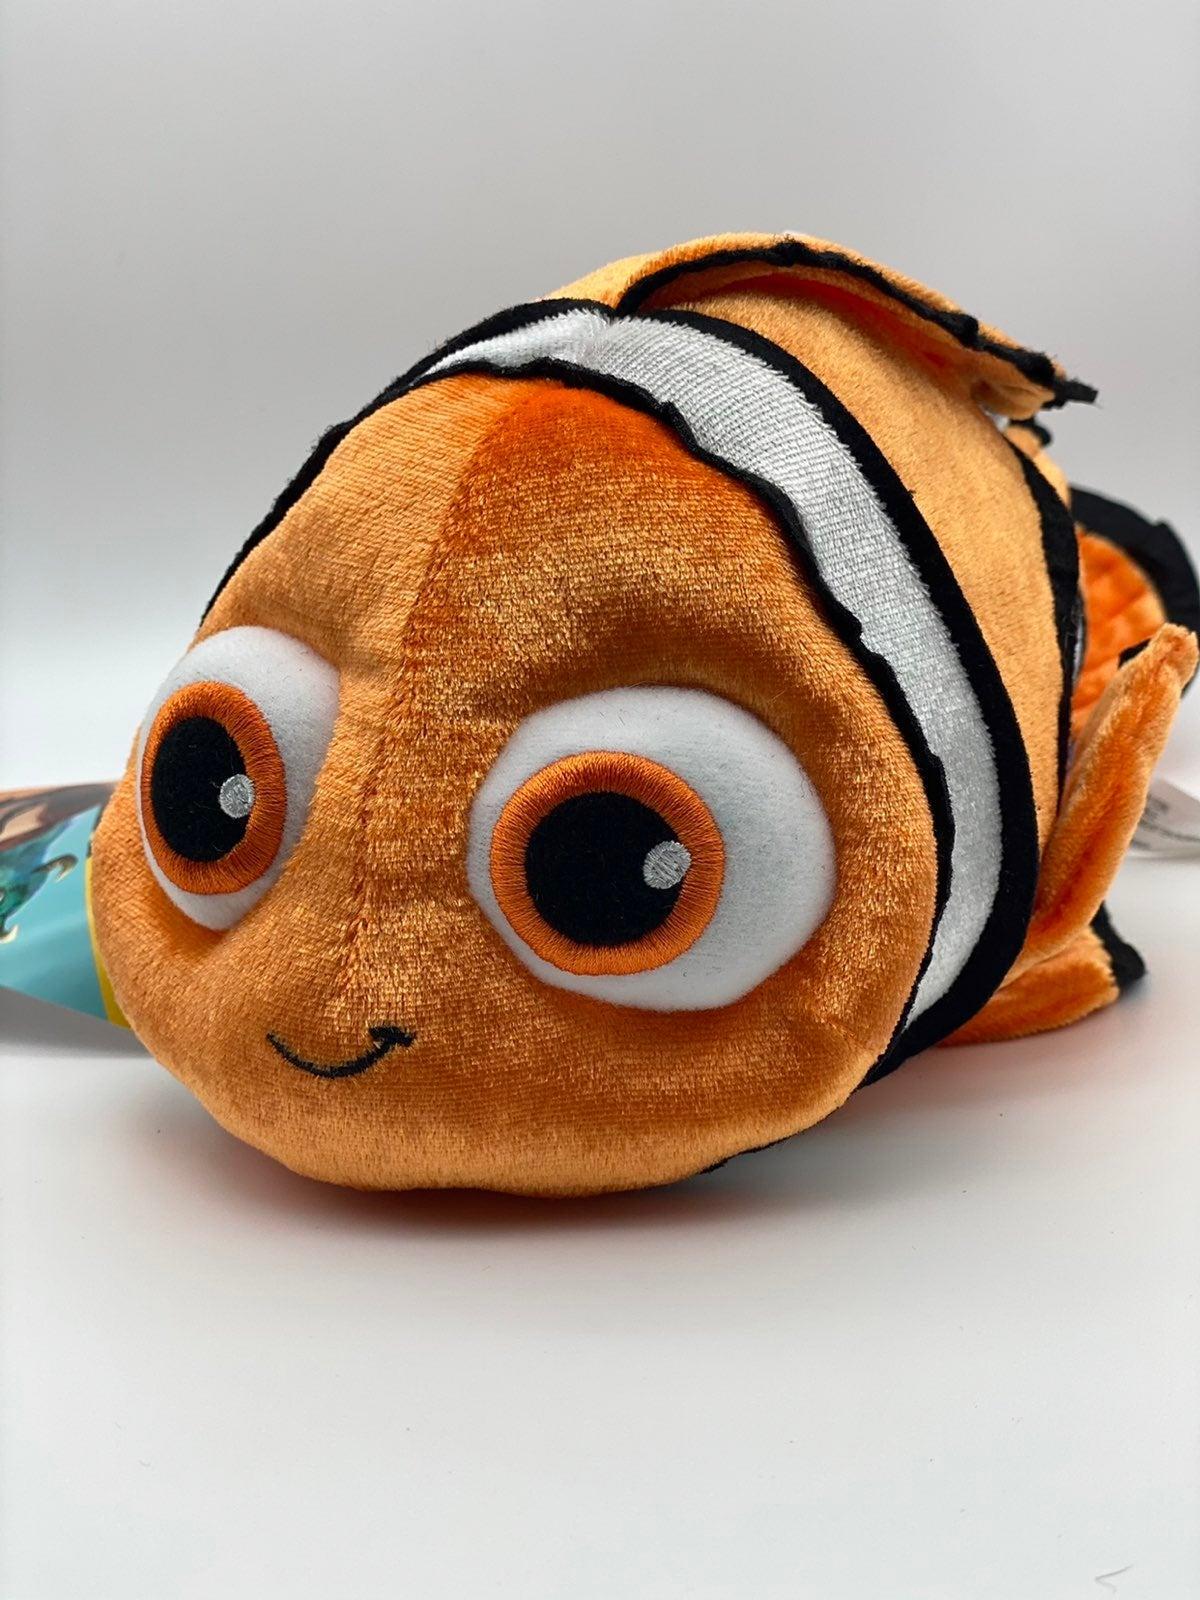 Disney Pixar Finding Nemo - Nemo Plush